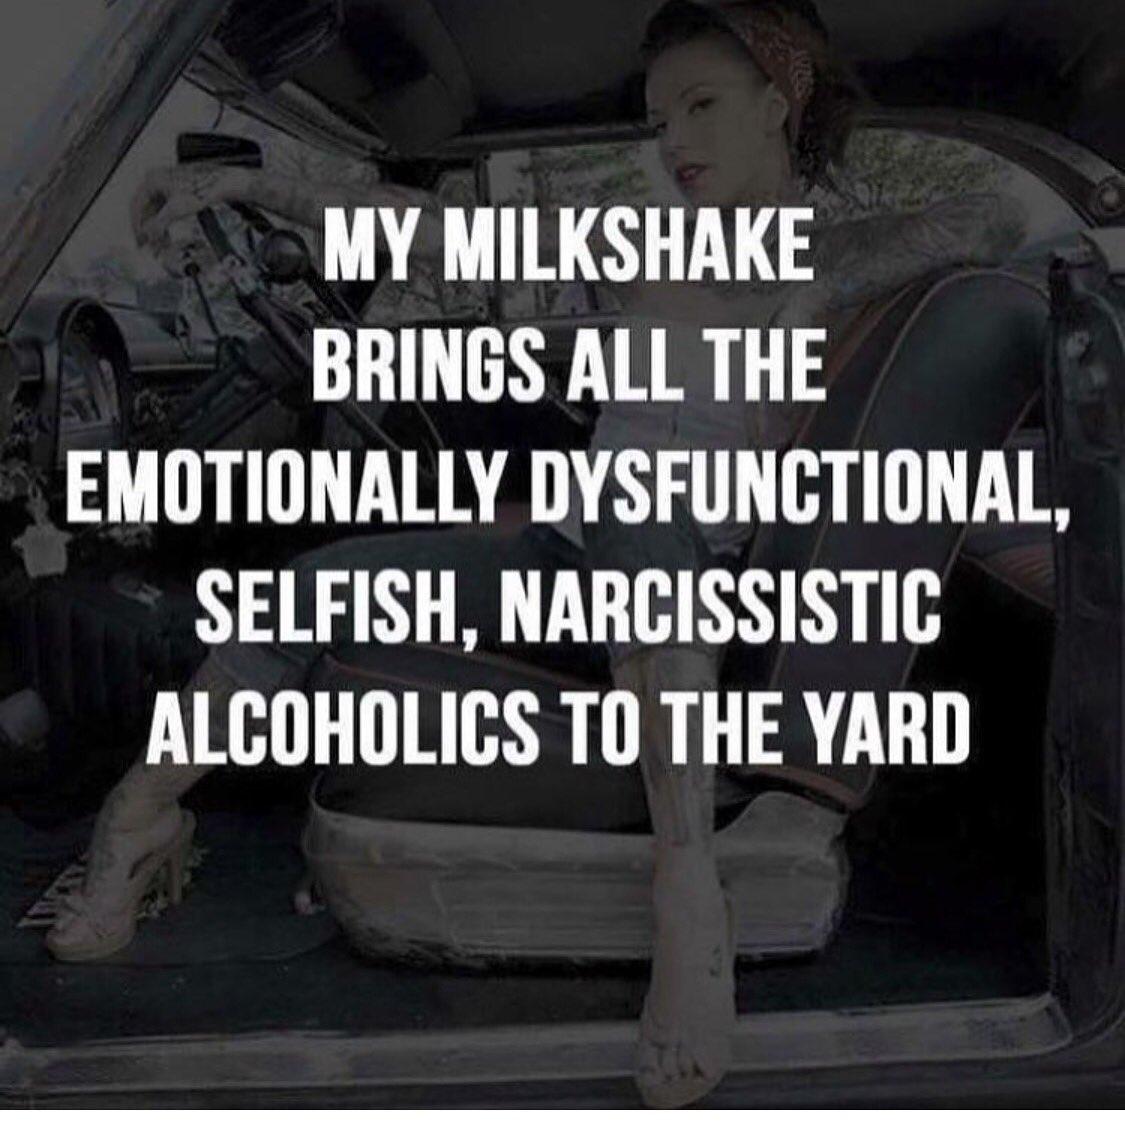 Asshole milk shake